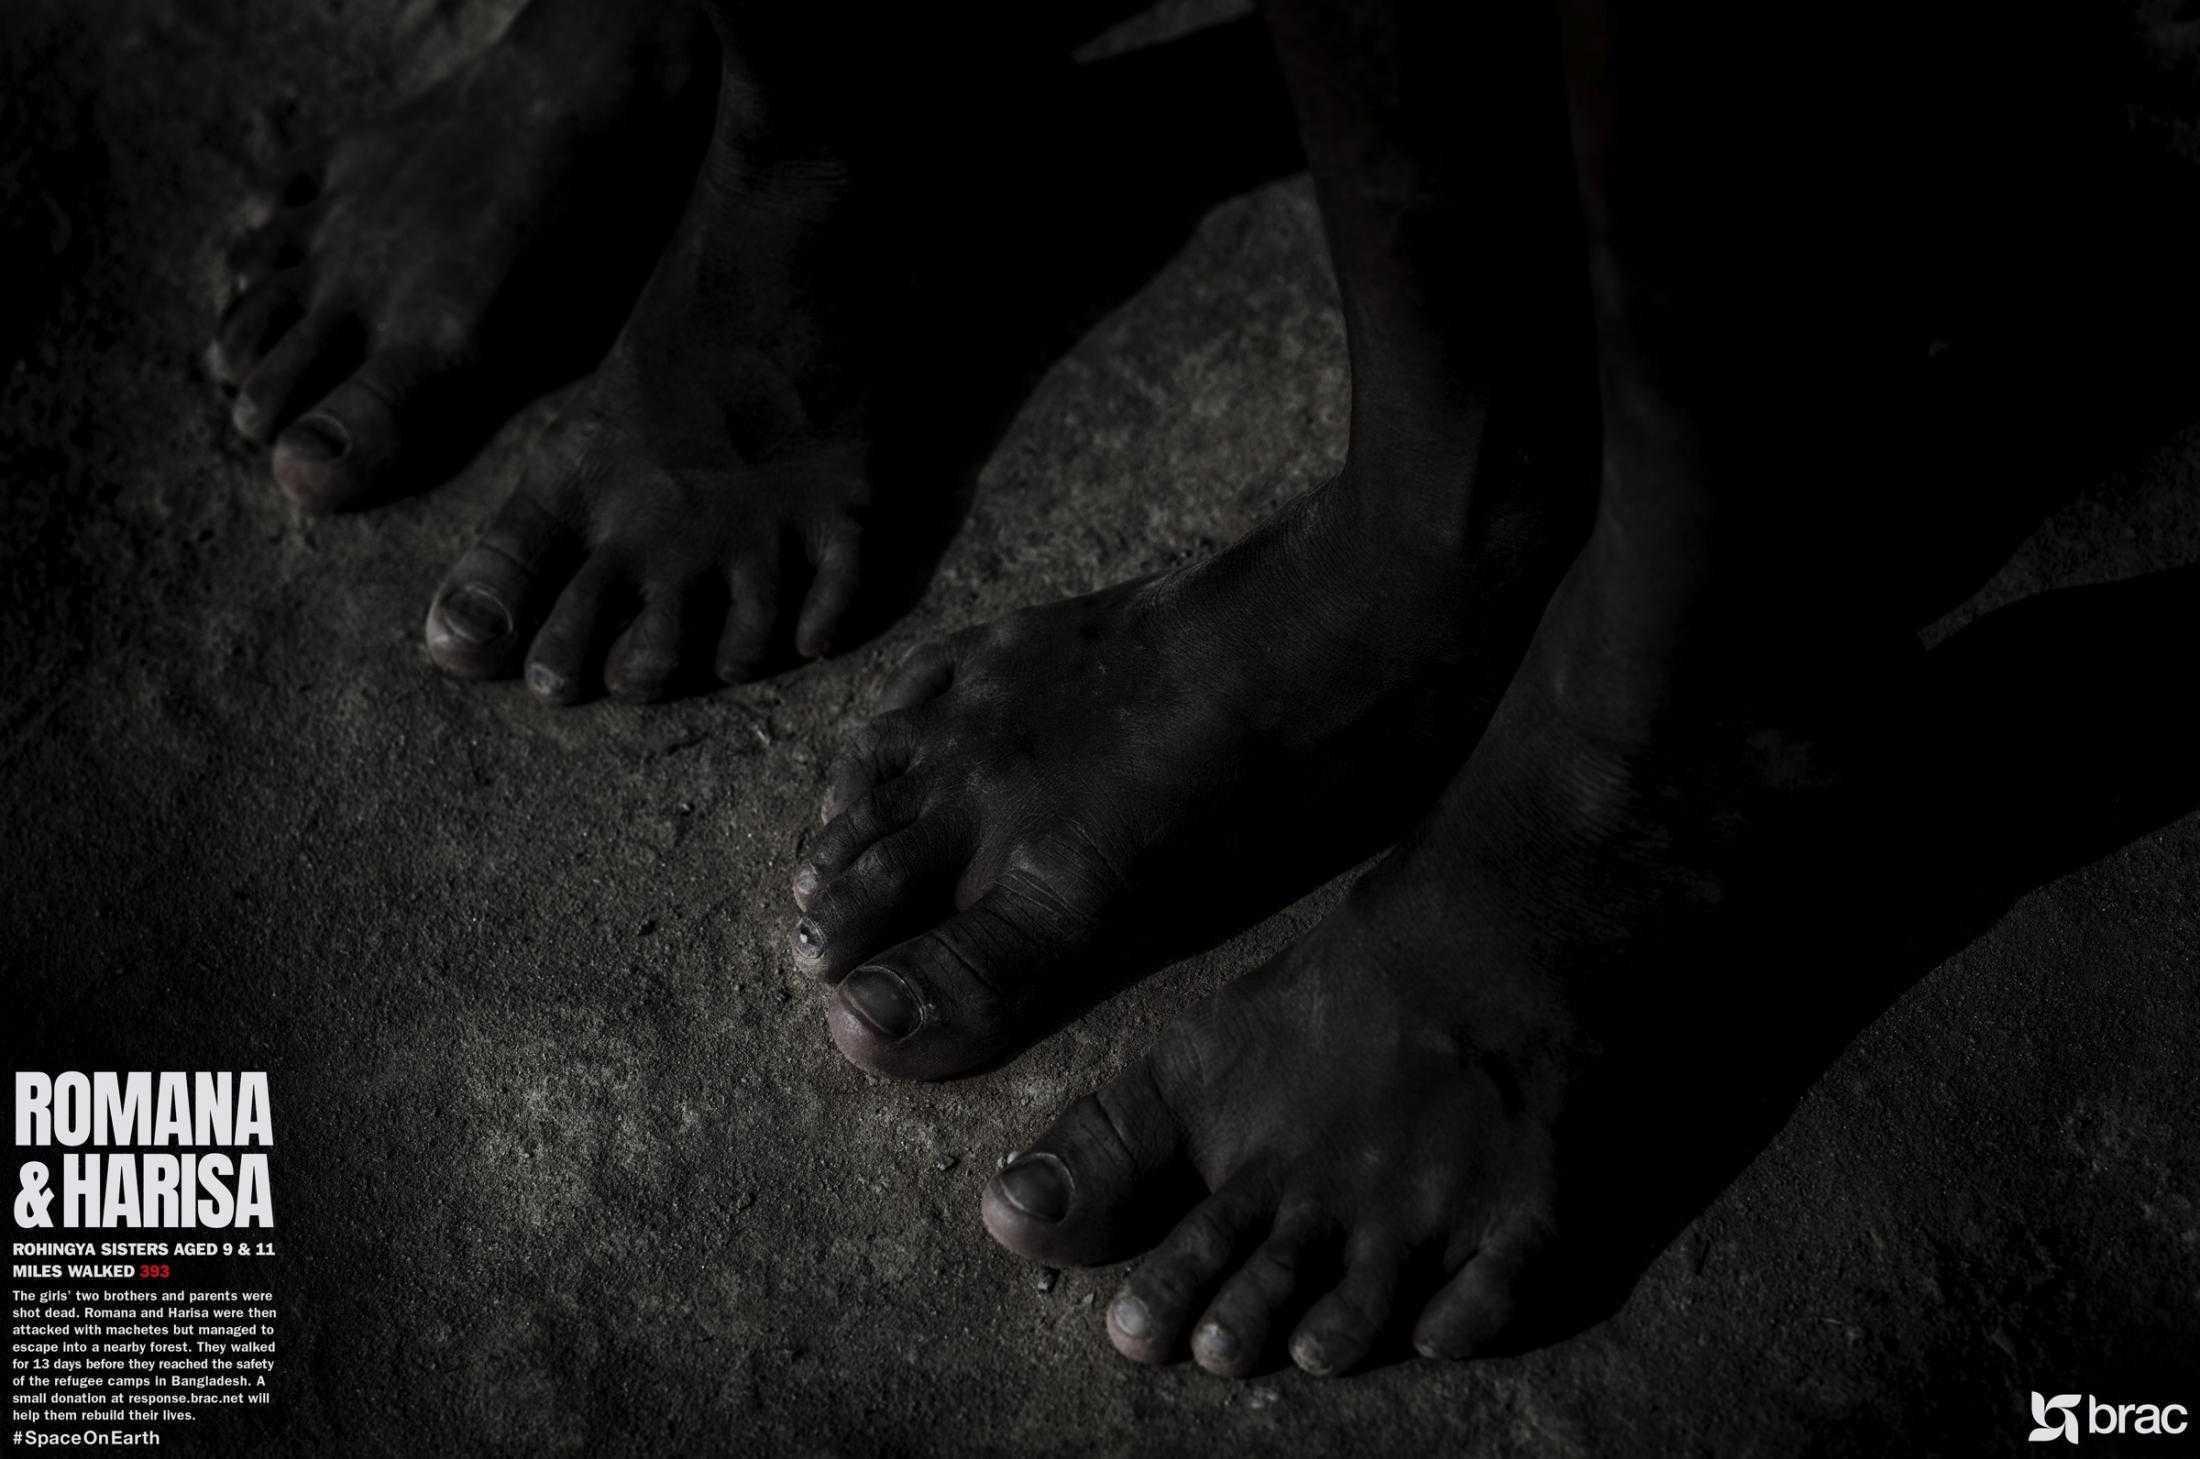 feet_r14_brac6_thumb